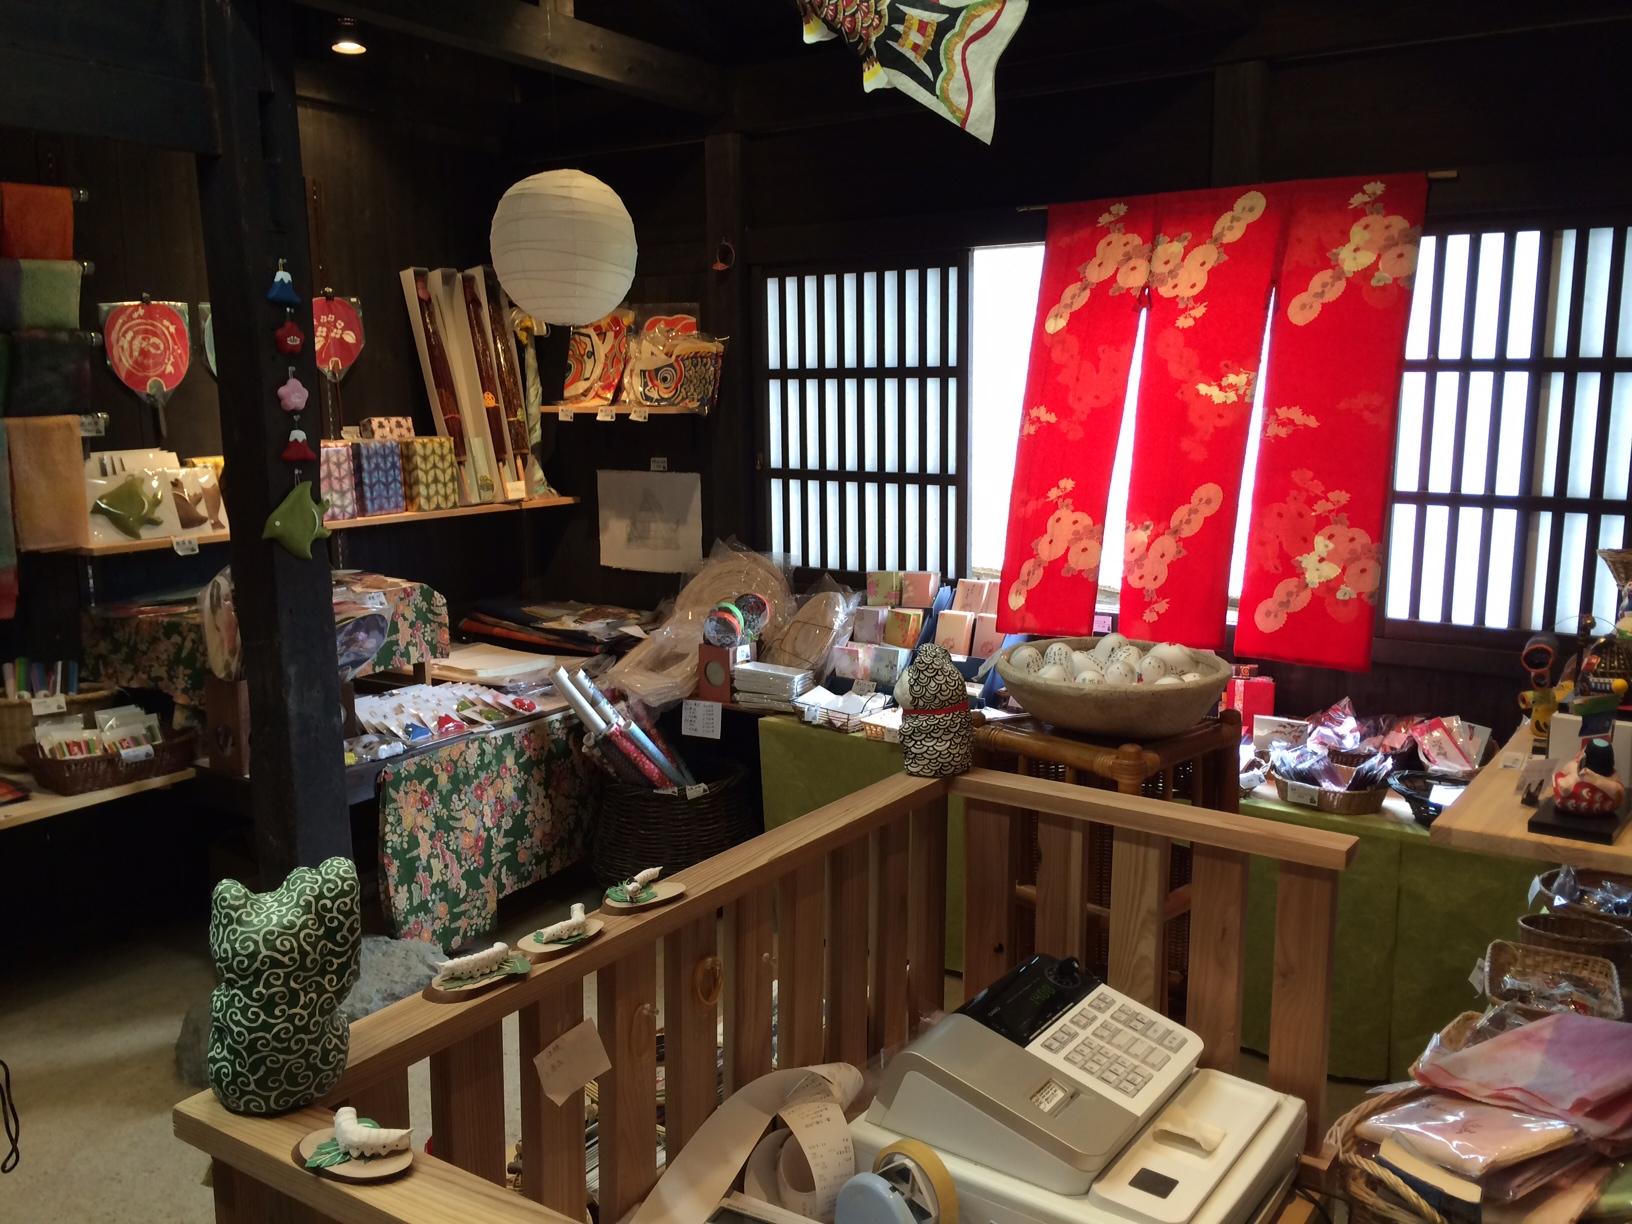 boutique washi dans ainokura chiyogami touch. Black Bedroom Furniture Sets. Home Design Ideas